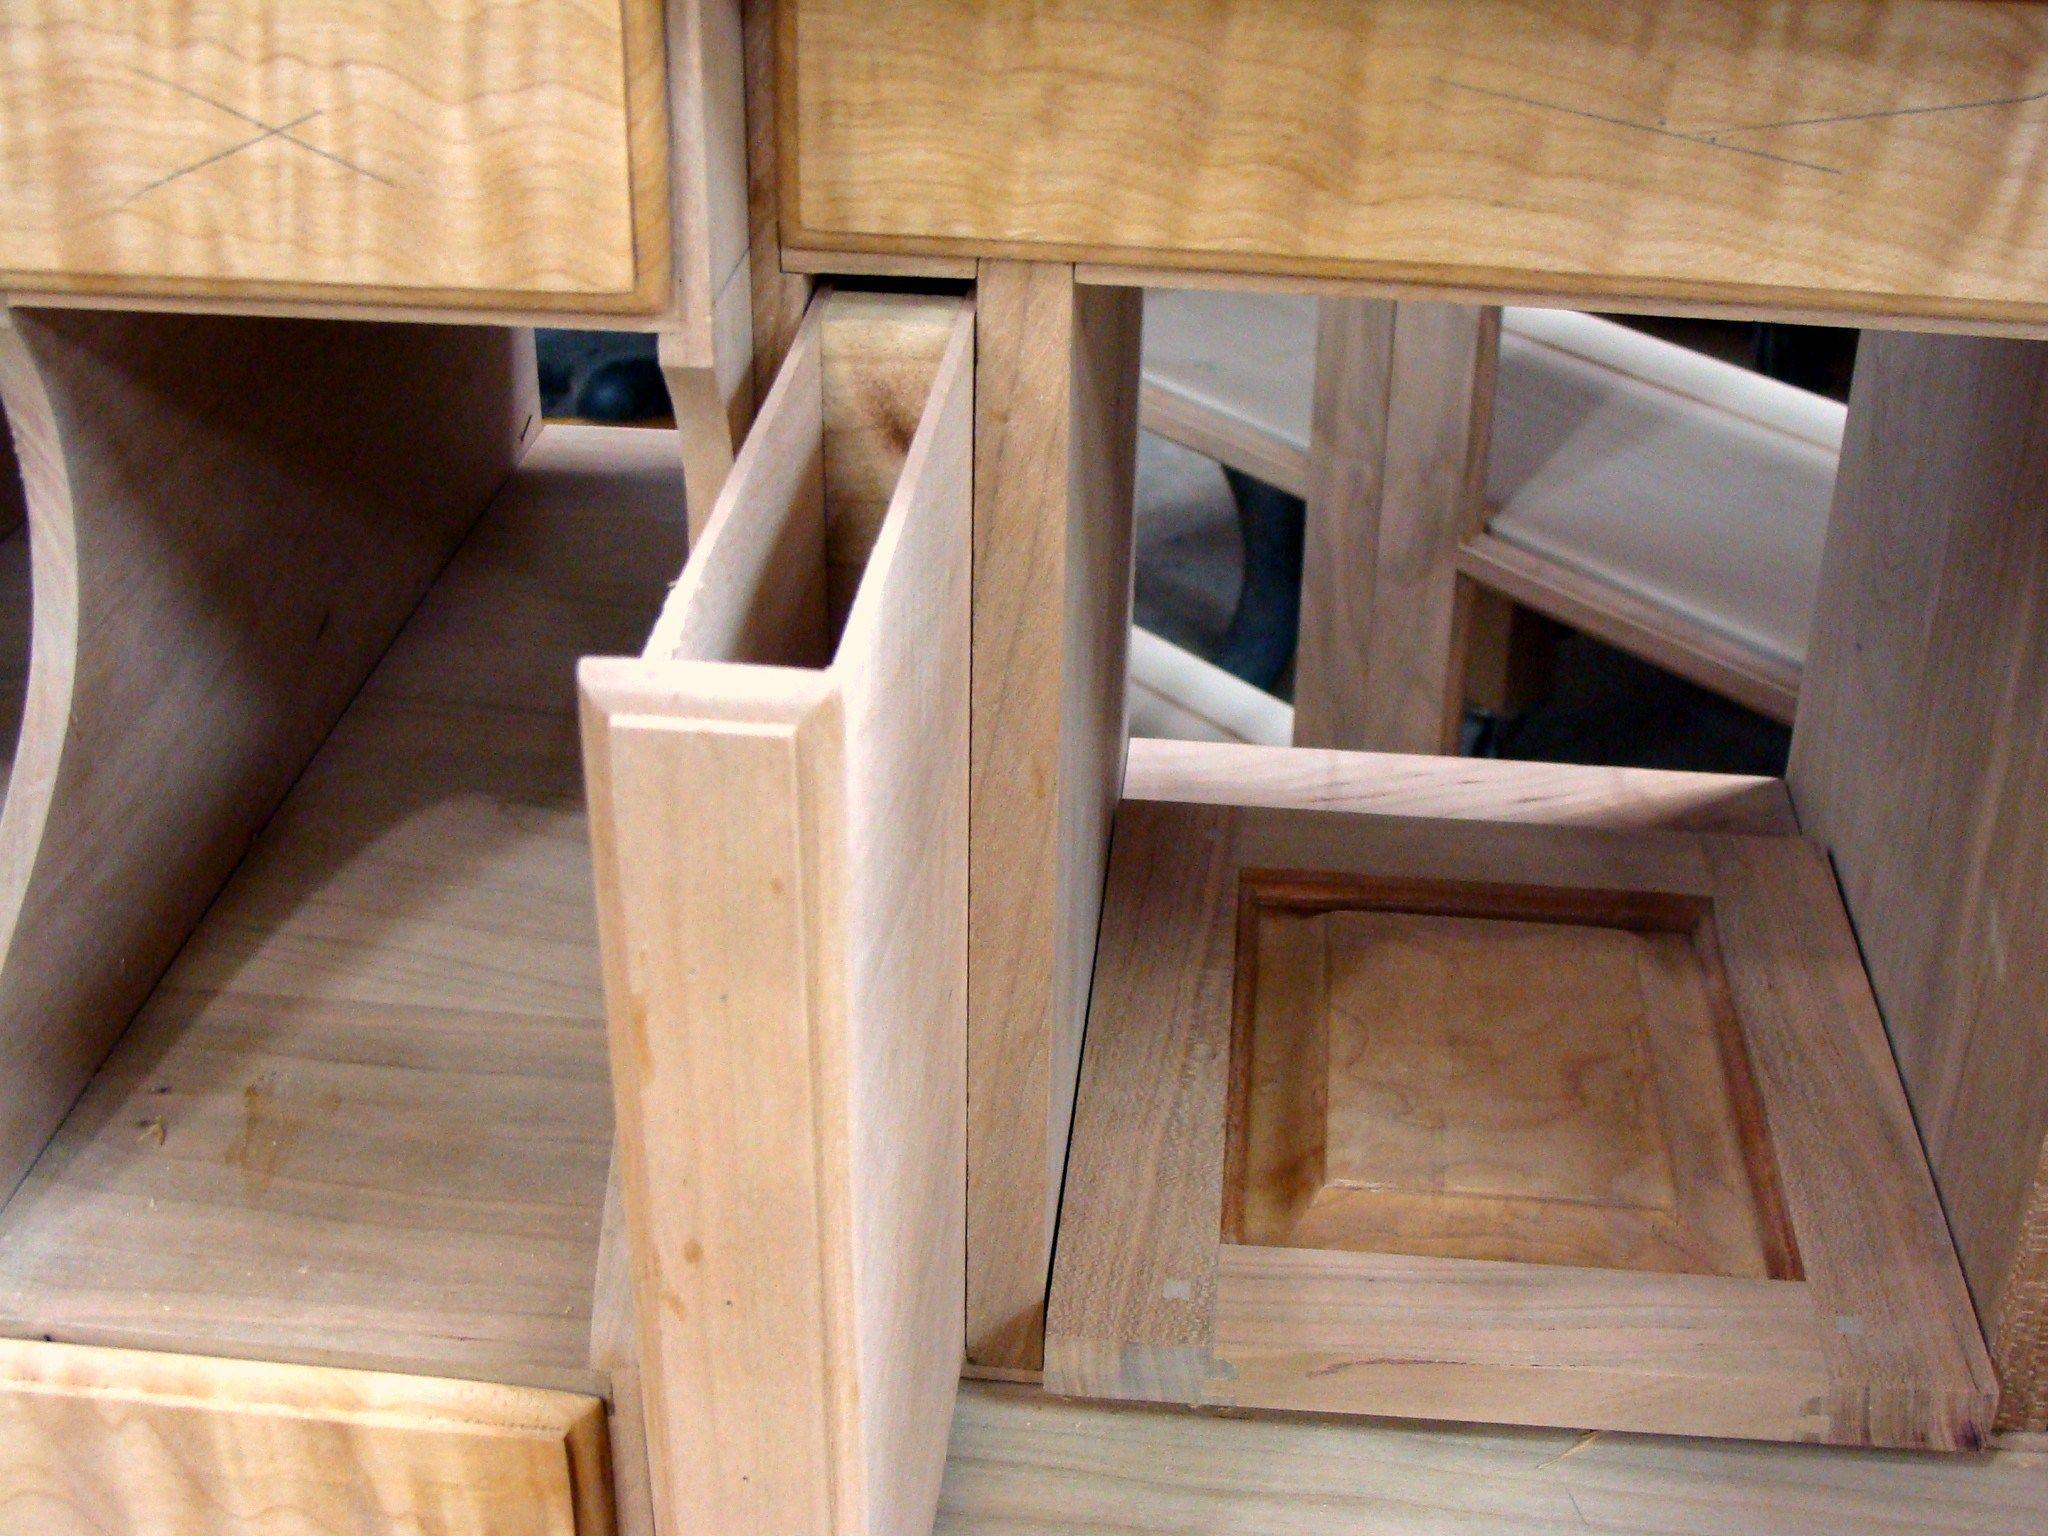 Hidden Compartments Slant Front Desk Hidden Compartments Secret Compartment Furniture Secret Hiding Containers